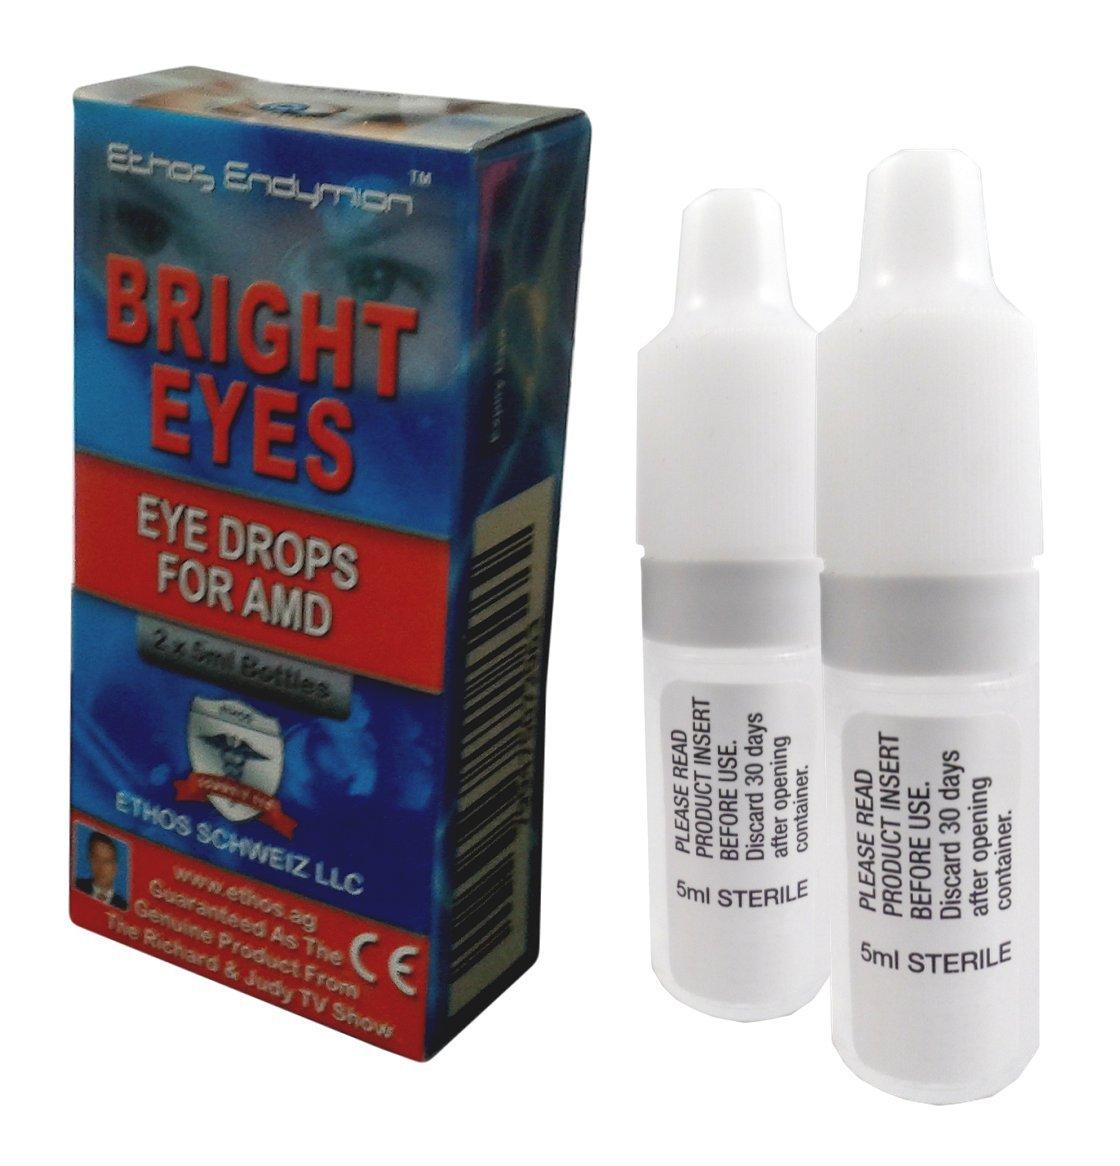 Ethos Bright EyesTM Carnosine NAC Eye Drops - 2 x 5ml Bottles - NAC Carnosine Eye Drops - NAC n Acetyl carnosine Eye Drops by Ethos